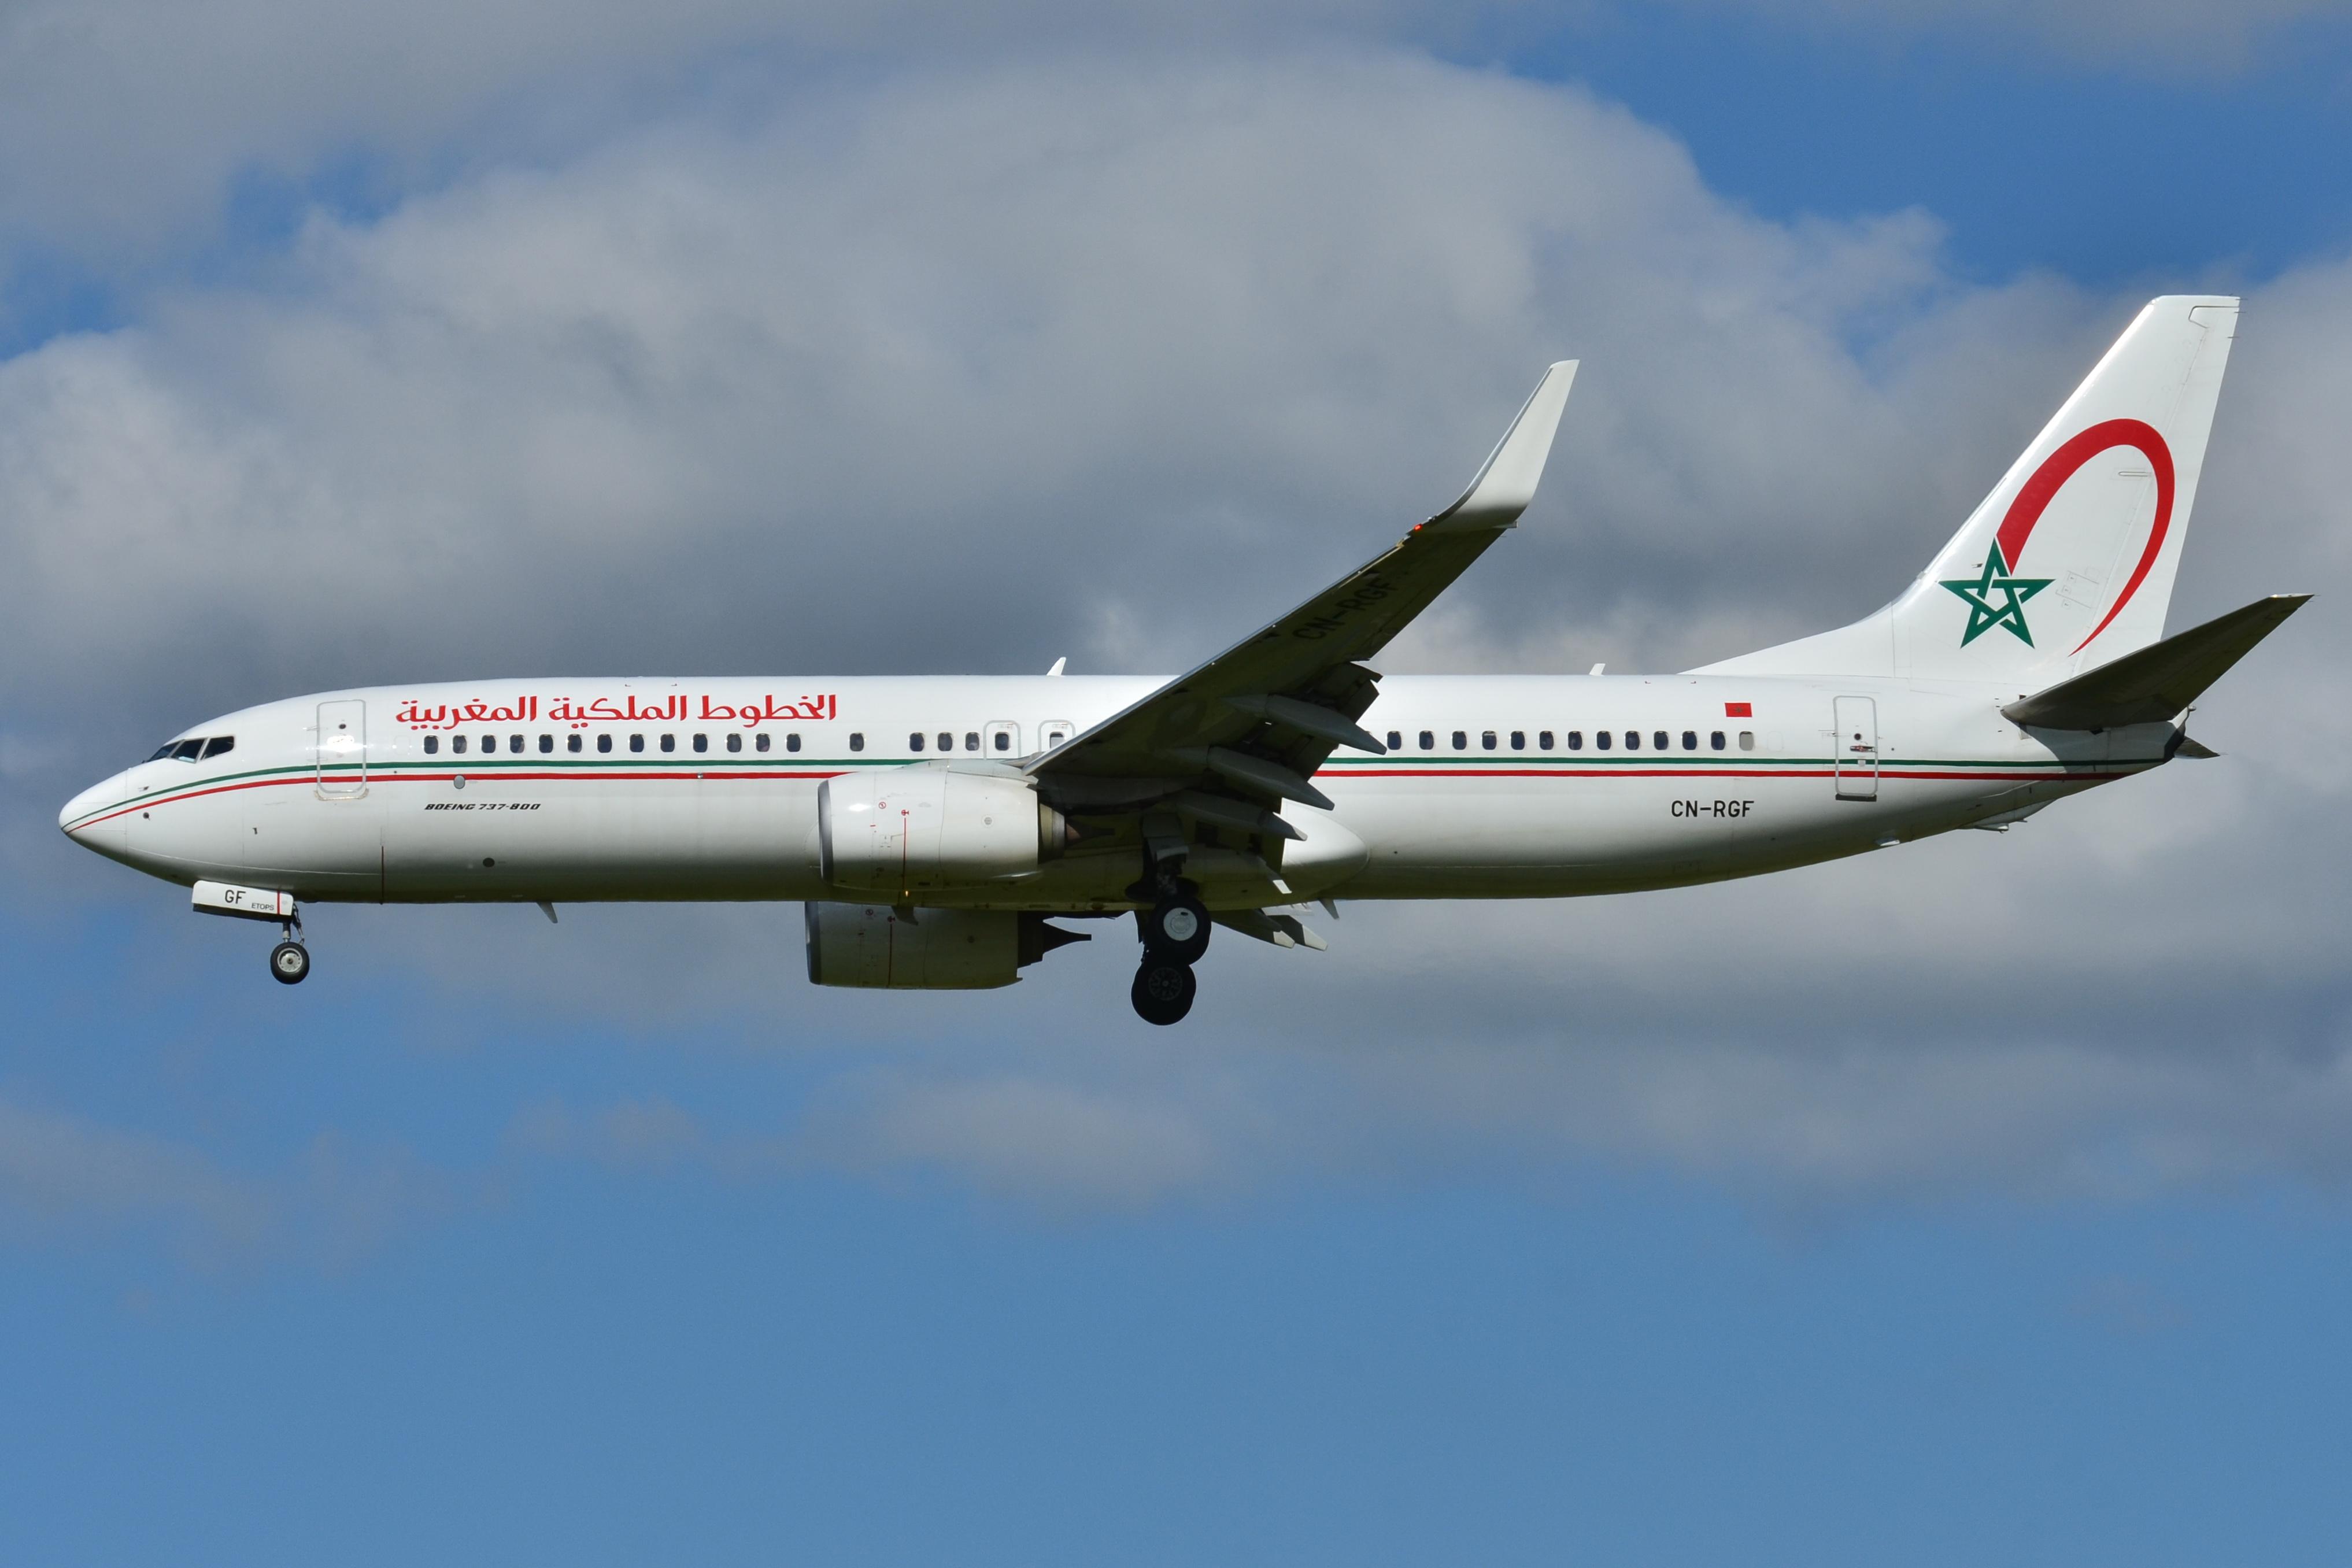 file boeing 737 800 royal air maroc ram cn rgf msn. Black Bedroom Furniture Sets. Home Design Ideas